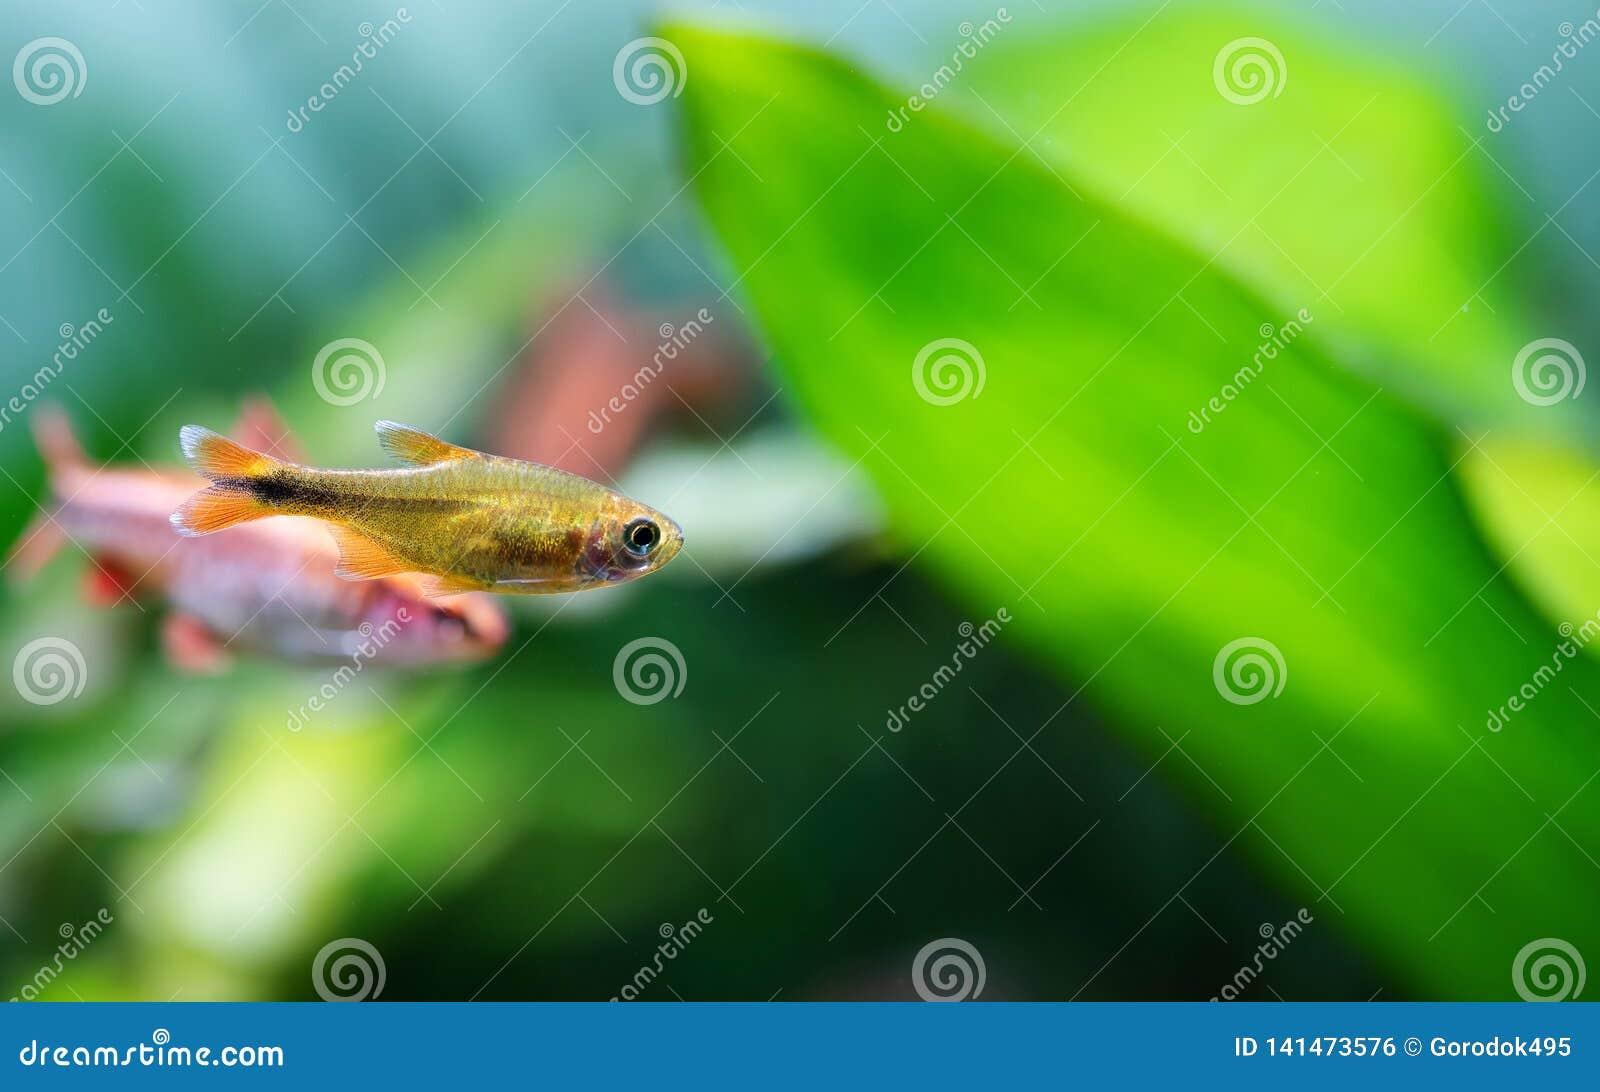 Aquarium fish Silver Tipped Tetra. Macro view orange gold color fish pattern, soft focus, green blurred background. copy